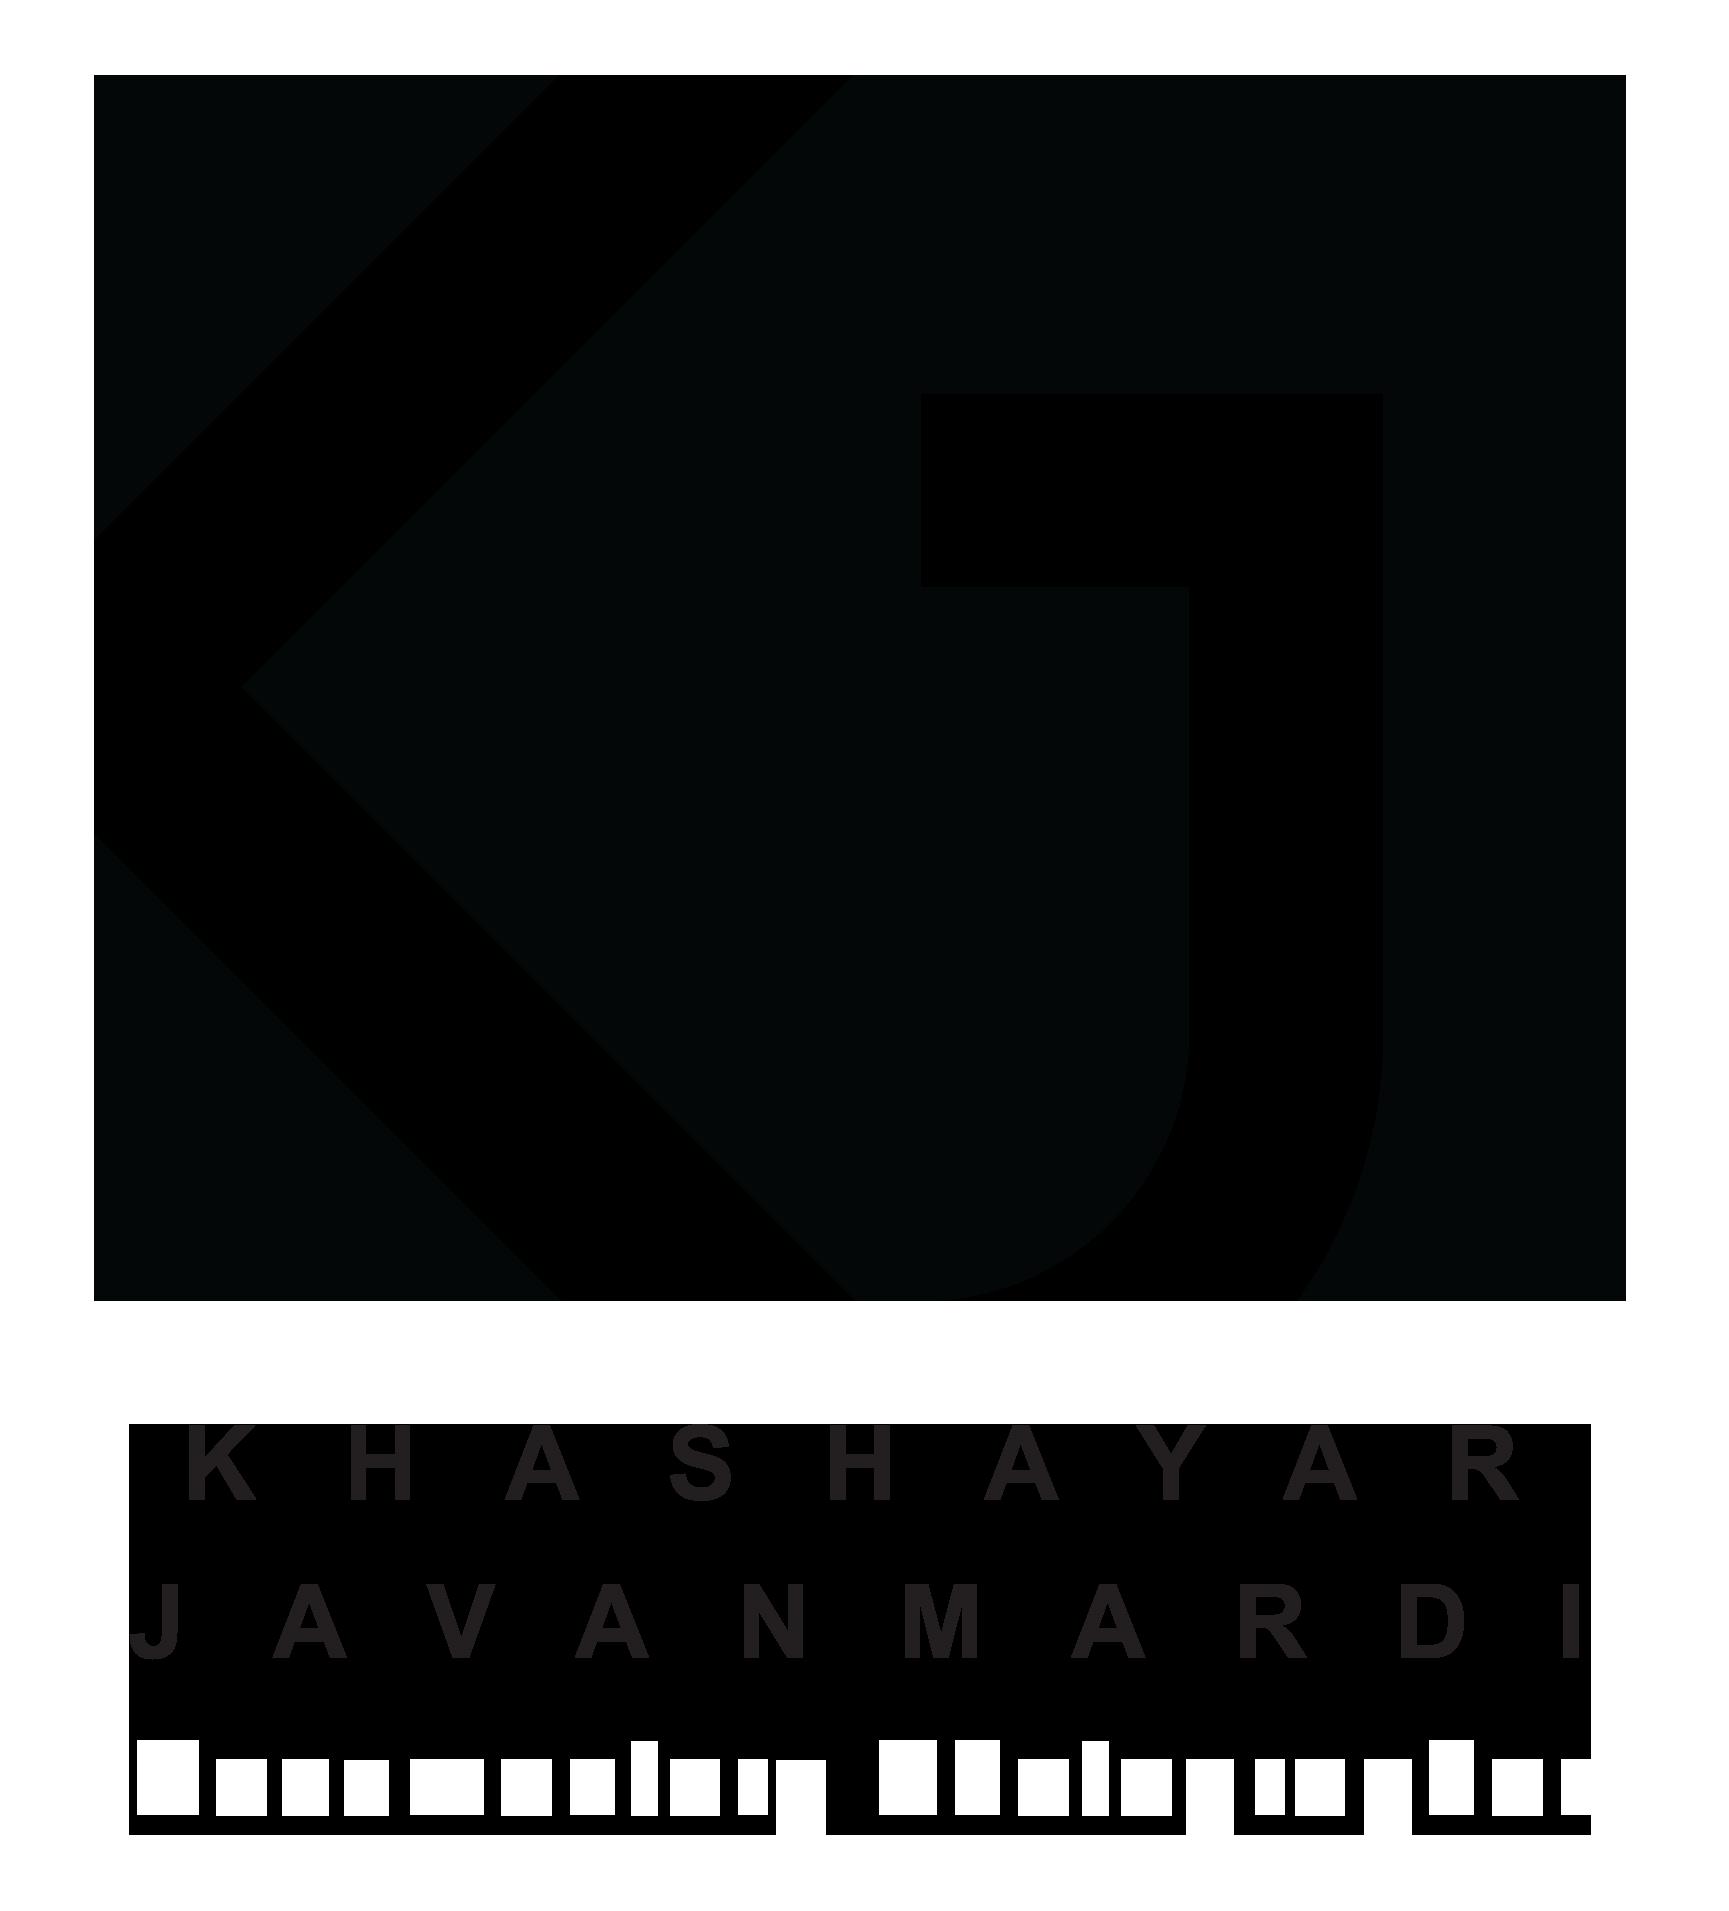 Khashayar Javanmardi | Iranian Photographer